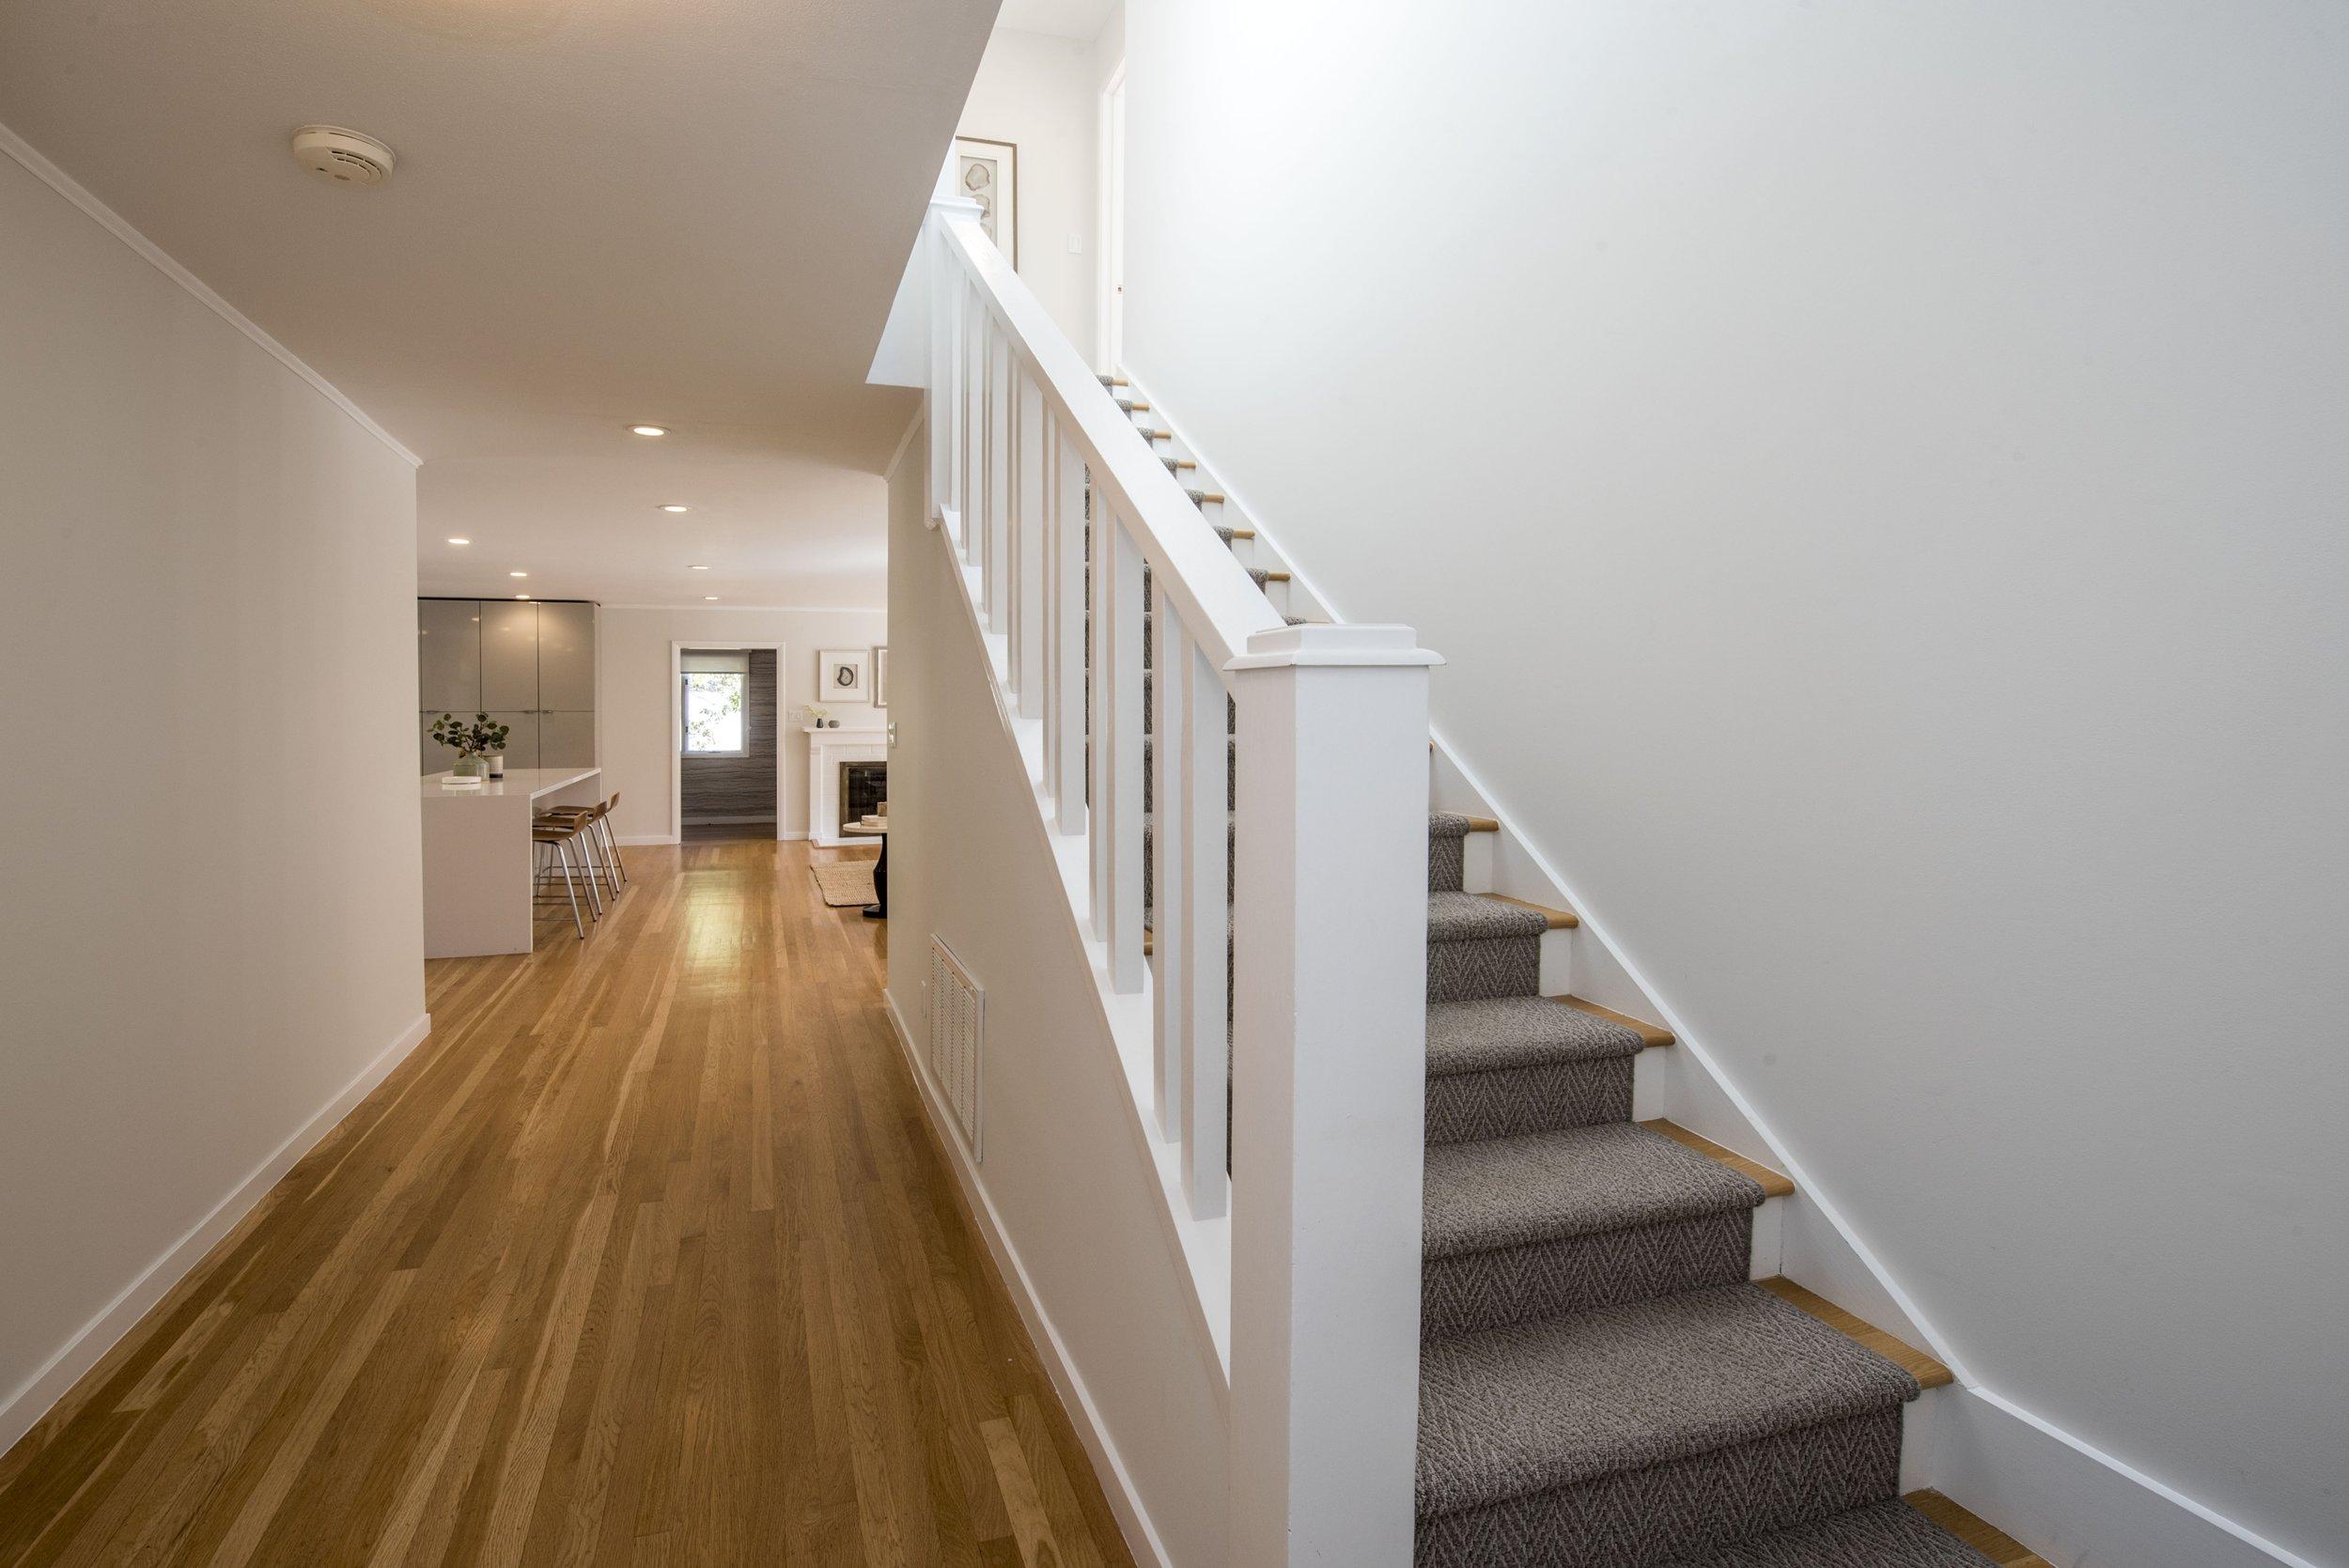 Stairs_DSC_3744.jpg